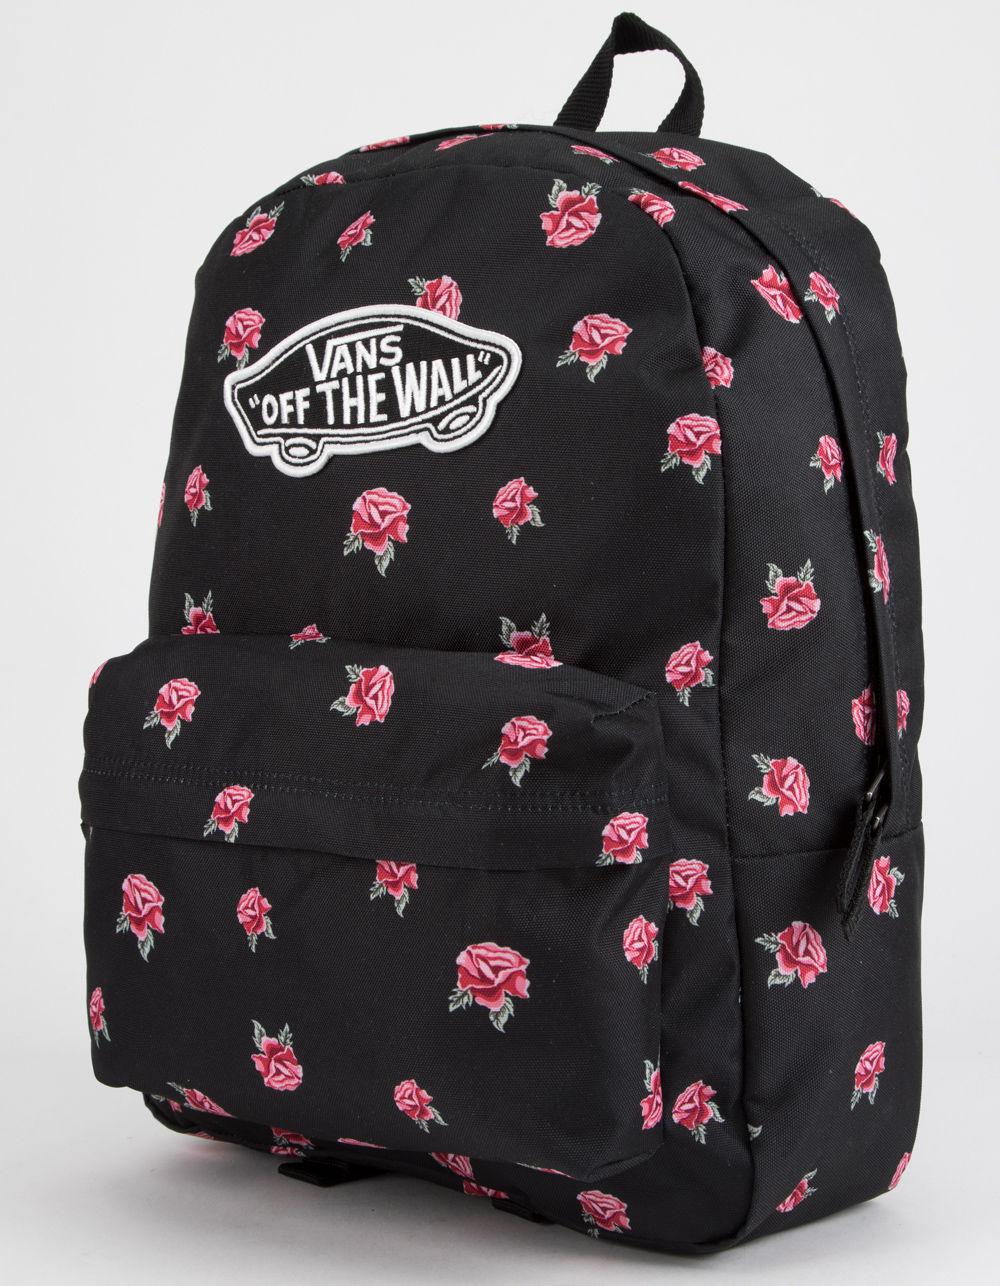 8b5b85206be1 Lyst - Vans Realm Black   Rose Backpack in Black